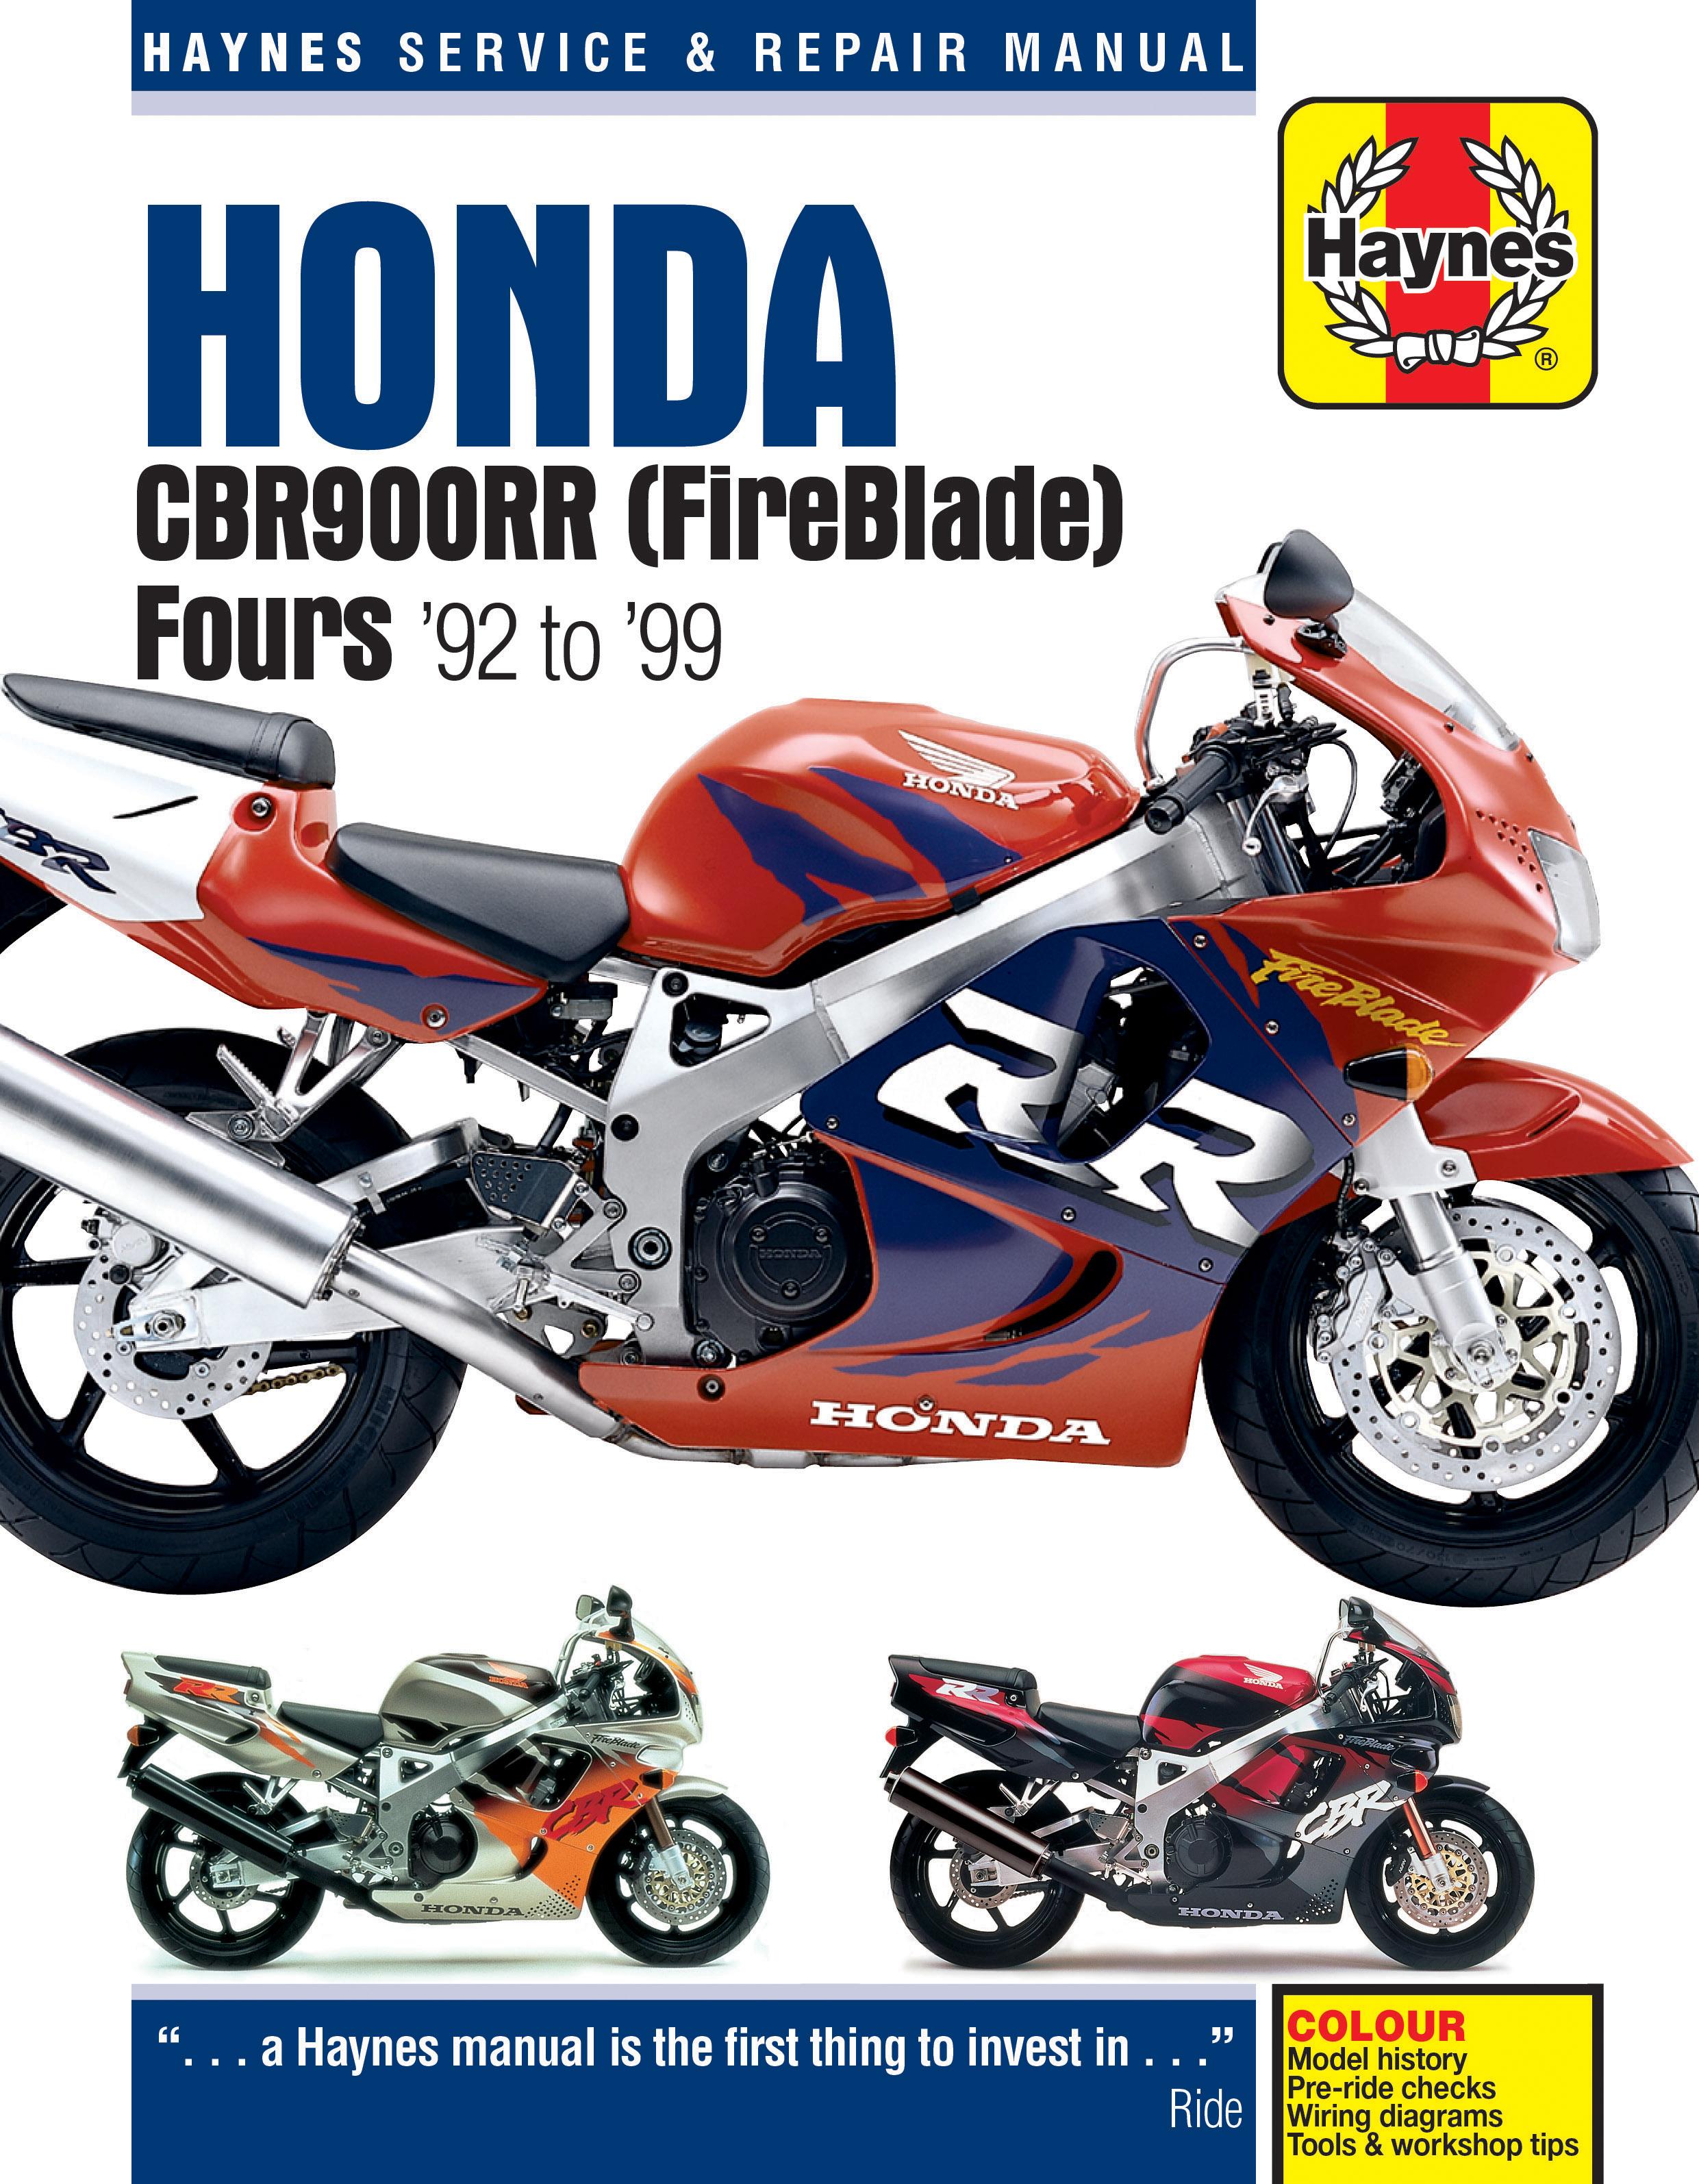 Honda CBR900RR FireBlade (92 - 99) Haynes Repair Manual